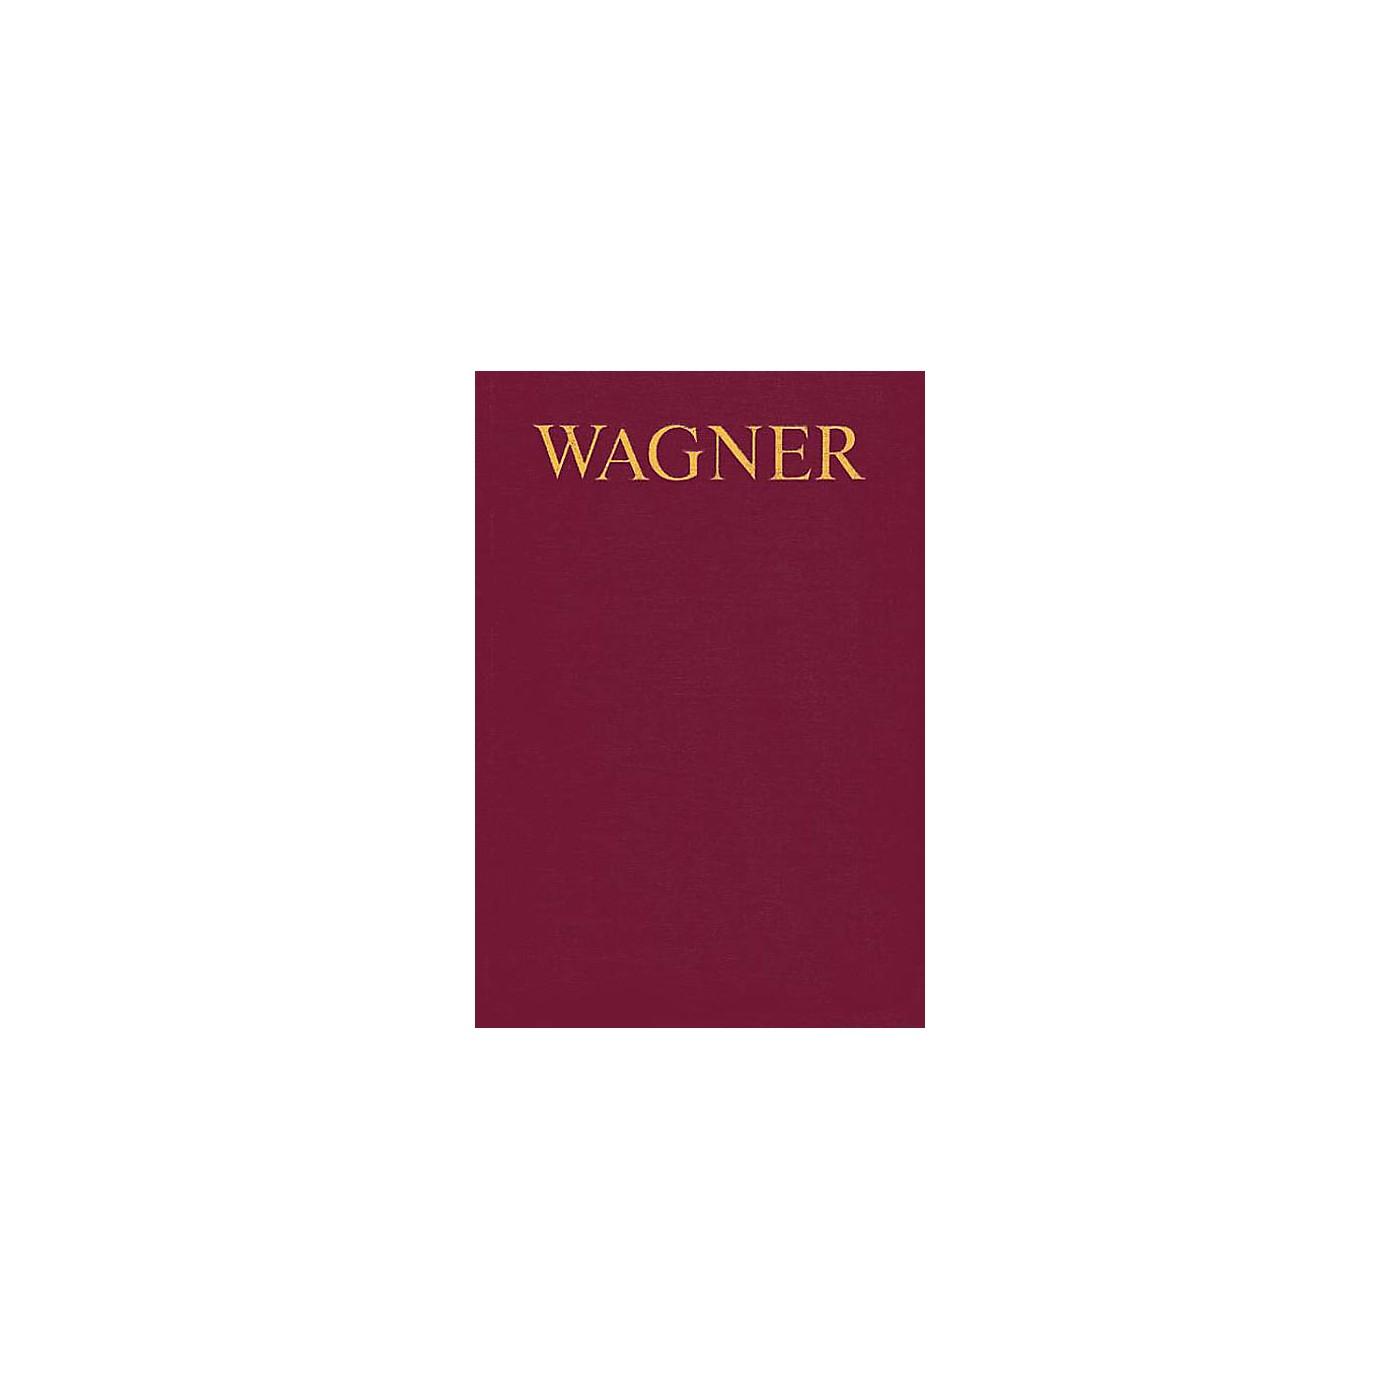 Schott Wagner Werkverzeichnis (German Text) Schott Series thumbnail